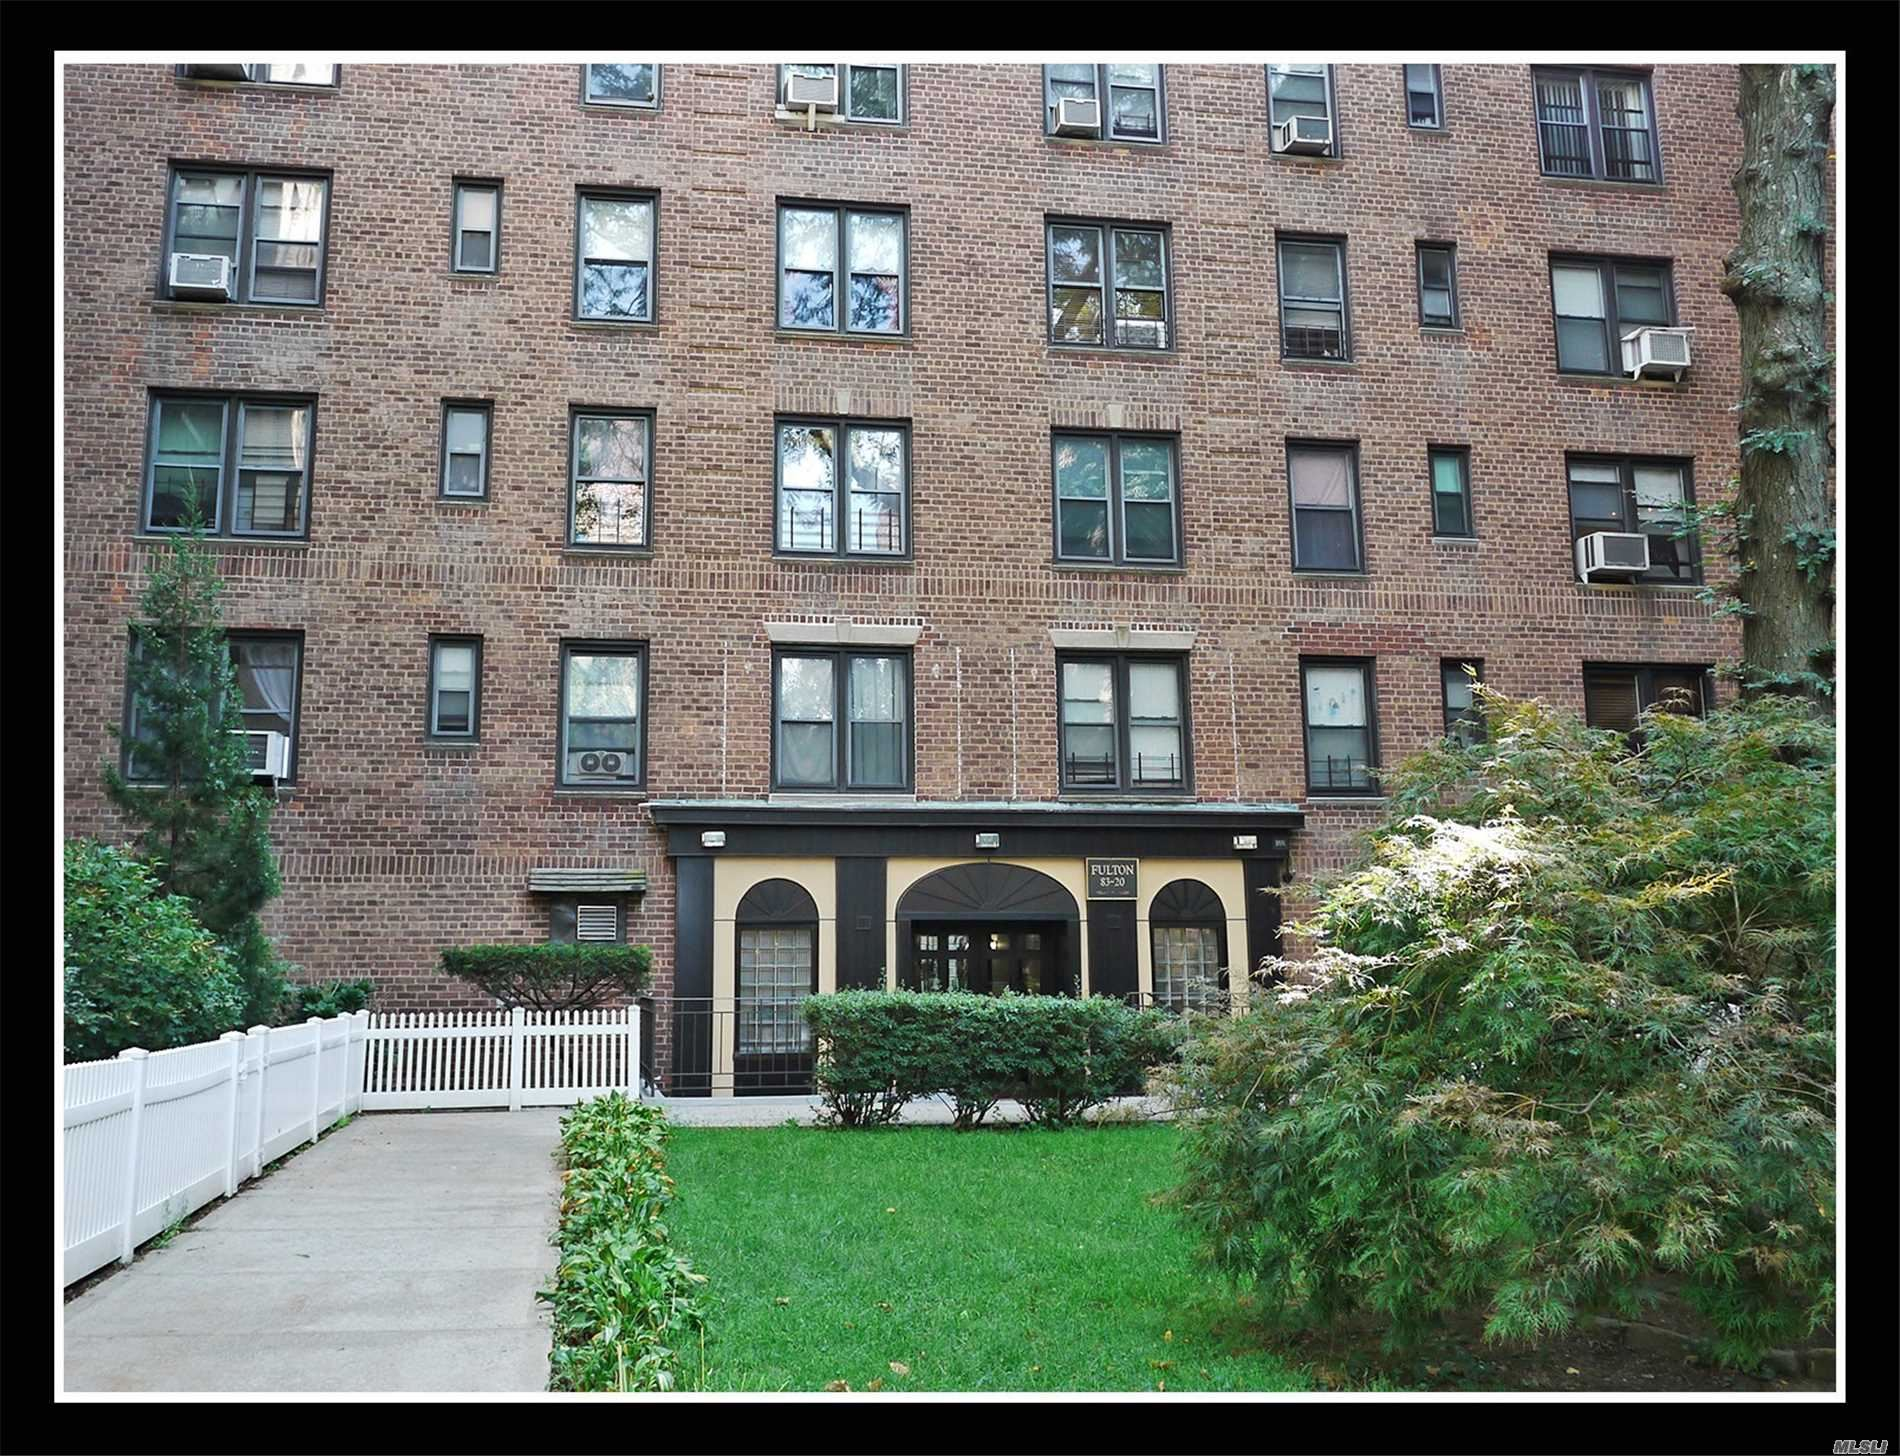 83-20 98 Street #3B, Woodhaven, NY 11421 - MLS#: 3239448